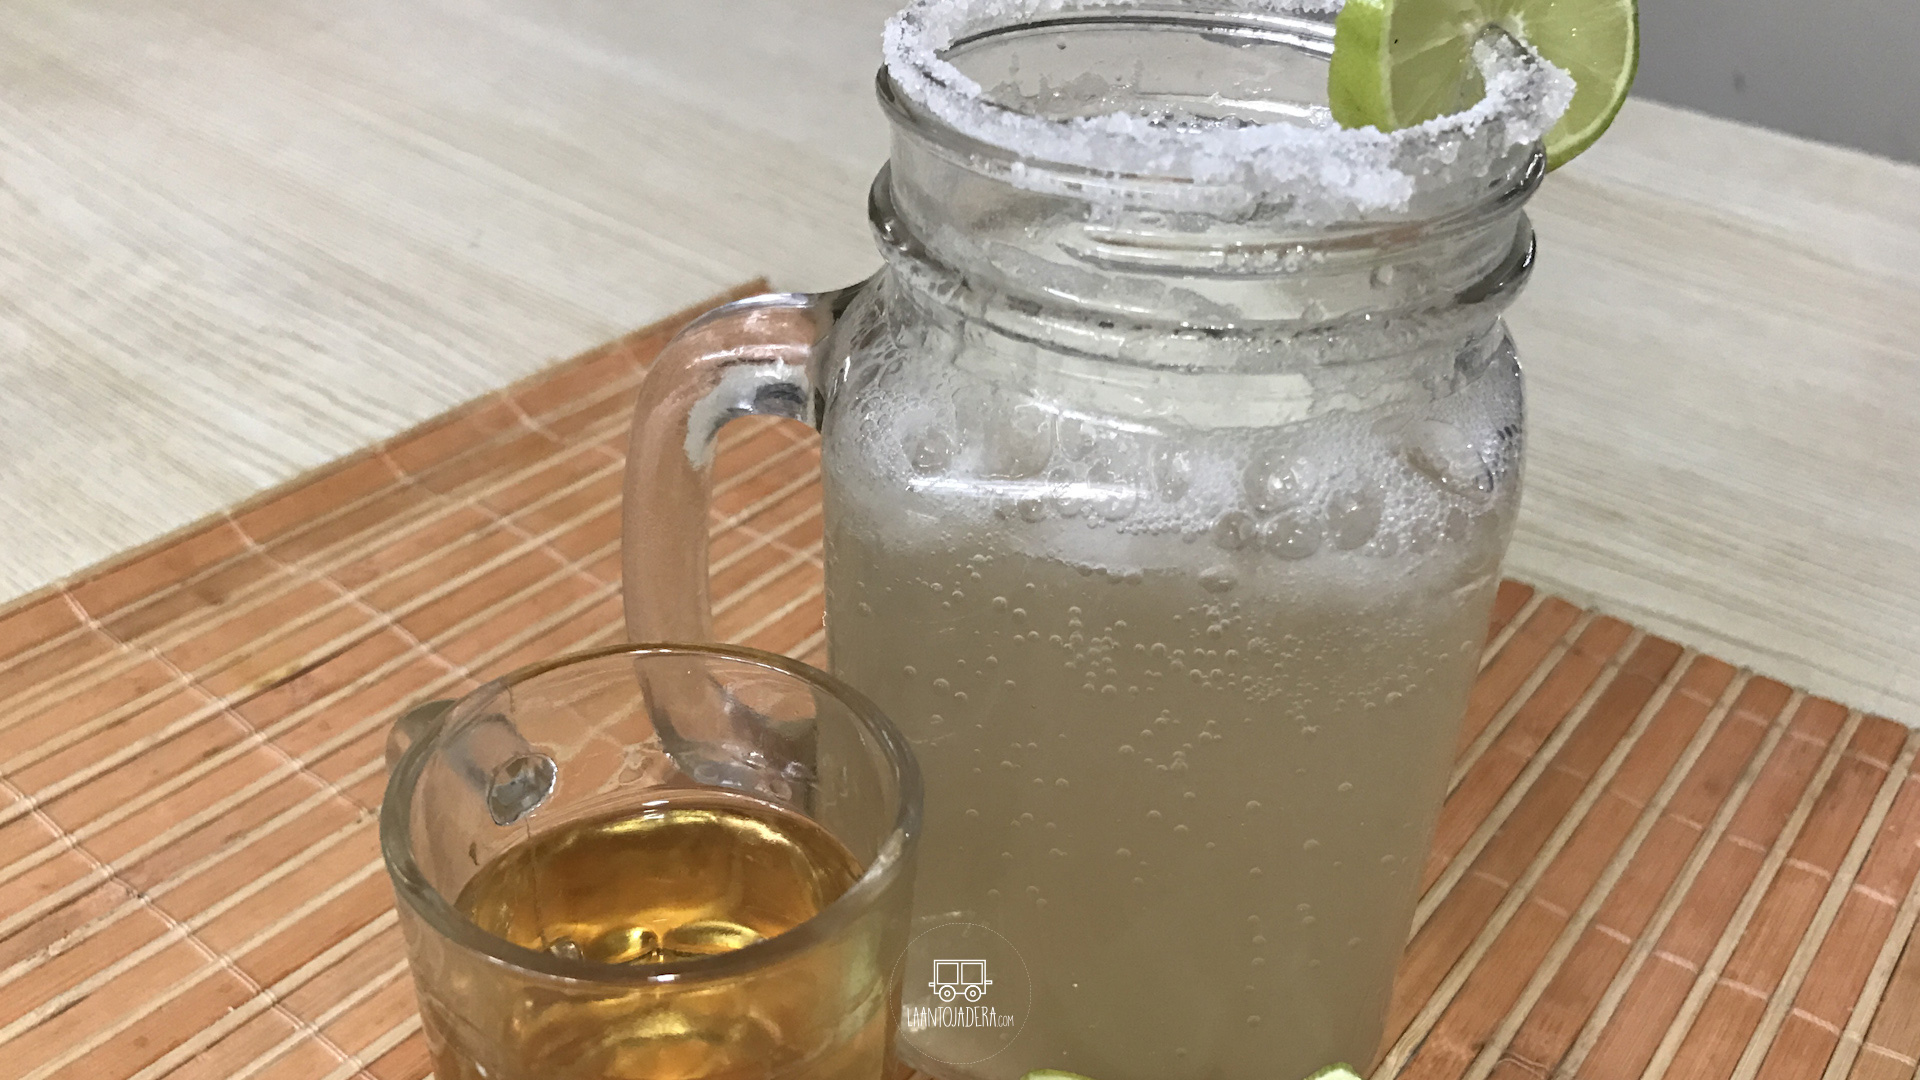 La Antojadera | Paloma con Tequila